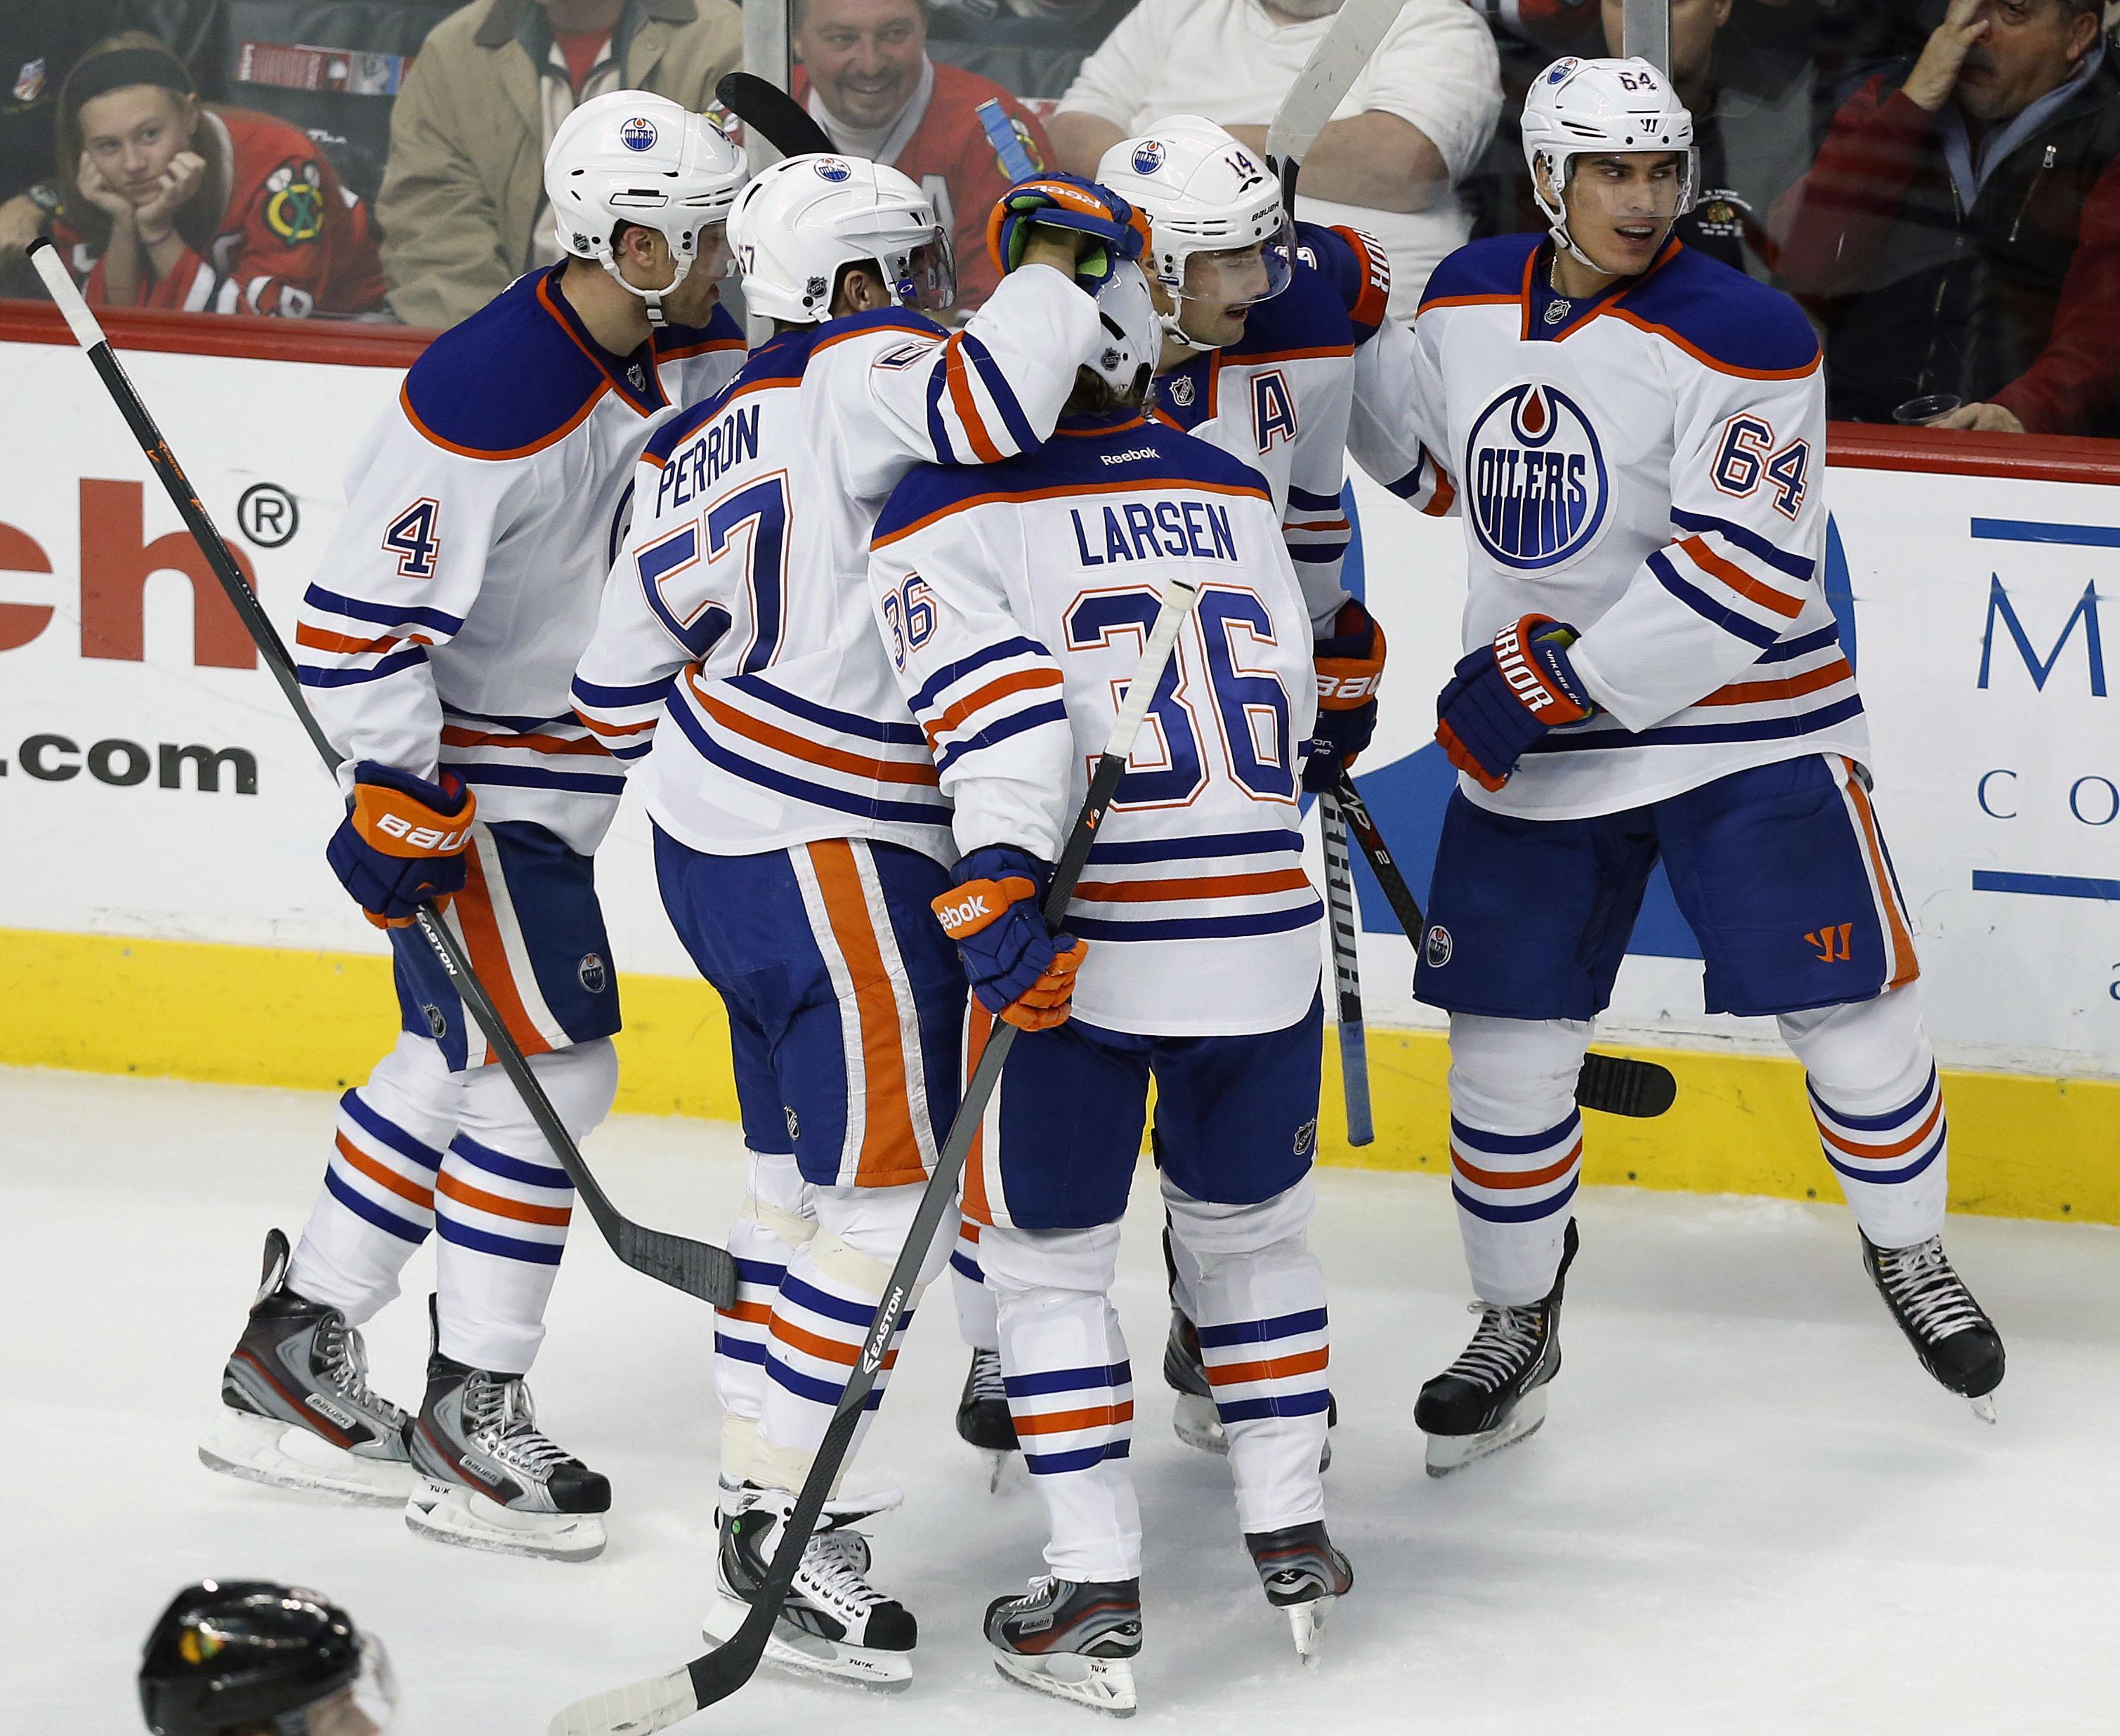 Kruger's goal helps Blackhawks edge Oilers 5-4